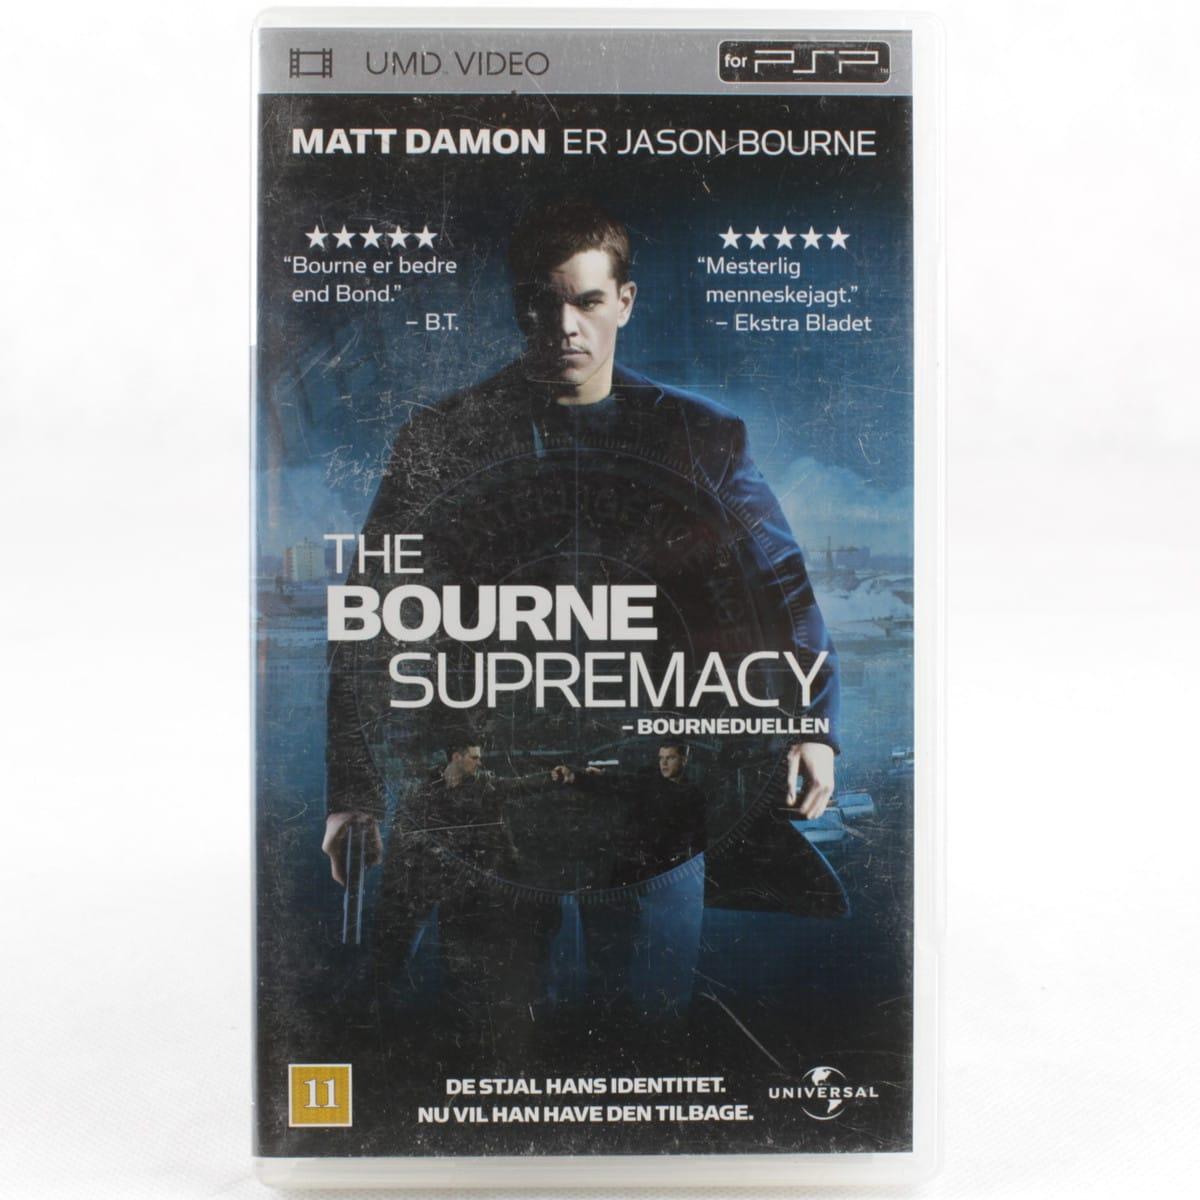 The Bourne Supremacy (Sony PSP - UMD Video)